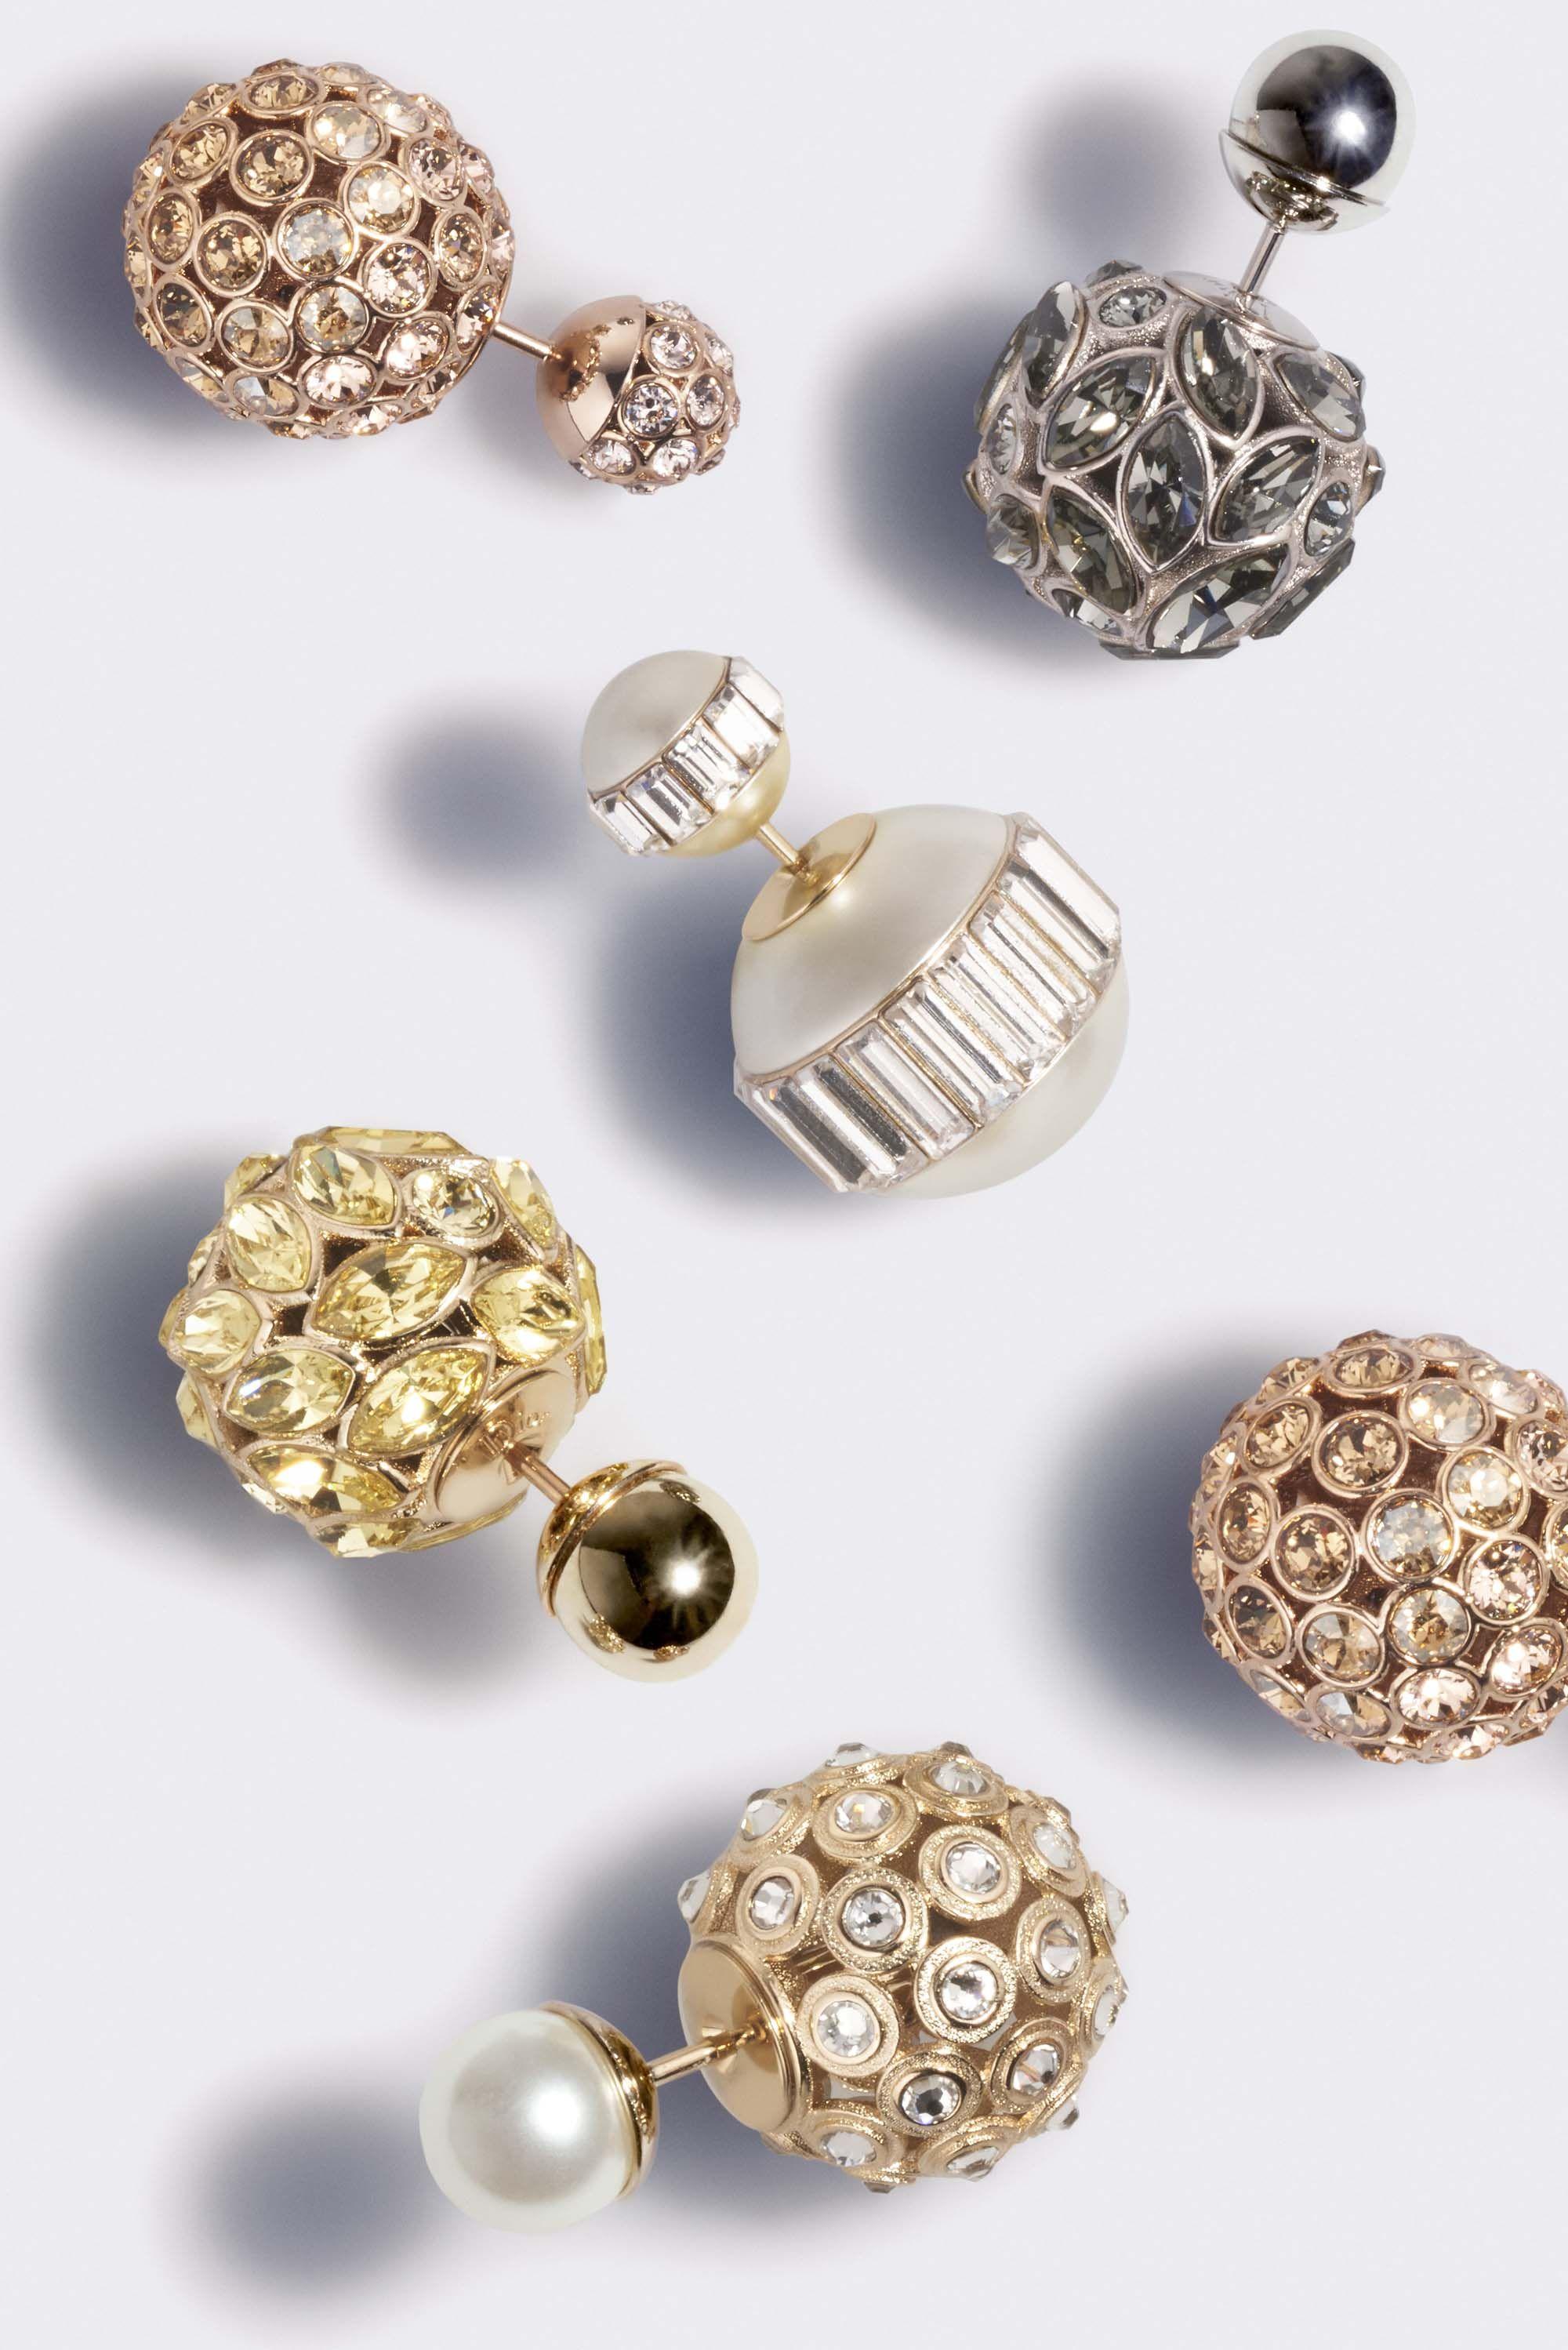 Dior Earrings, Easy To Fall In Love! #jewelrydesign #luxurydesign  #moderndesign Luxury